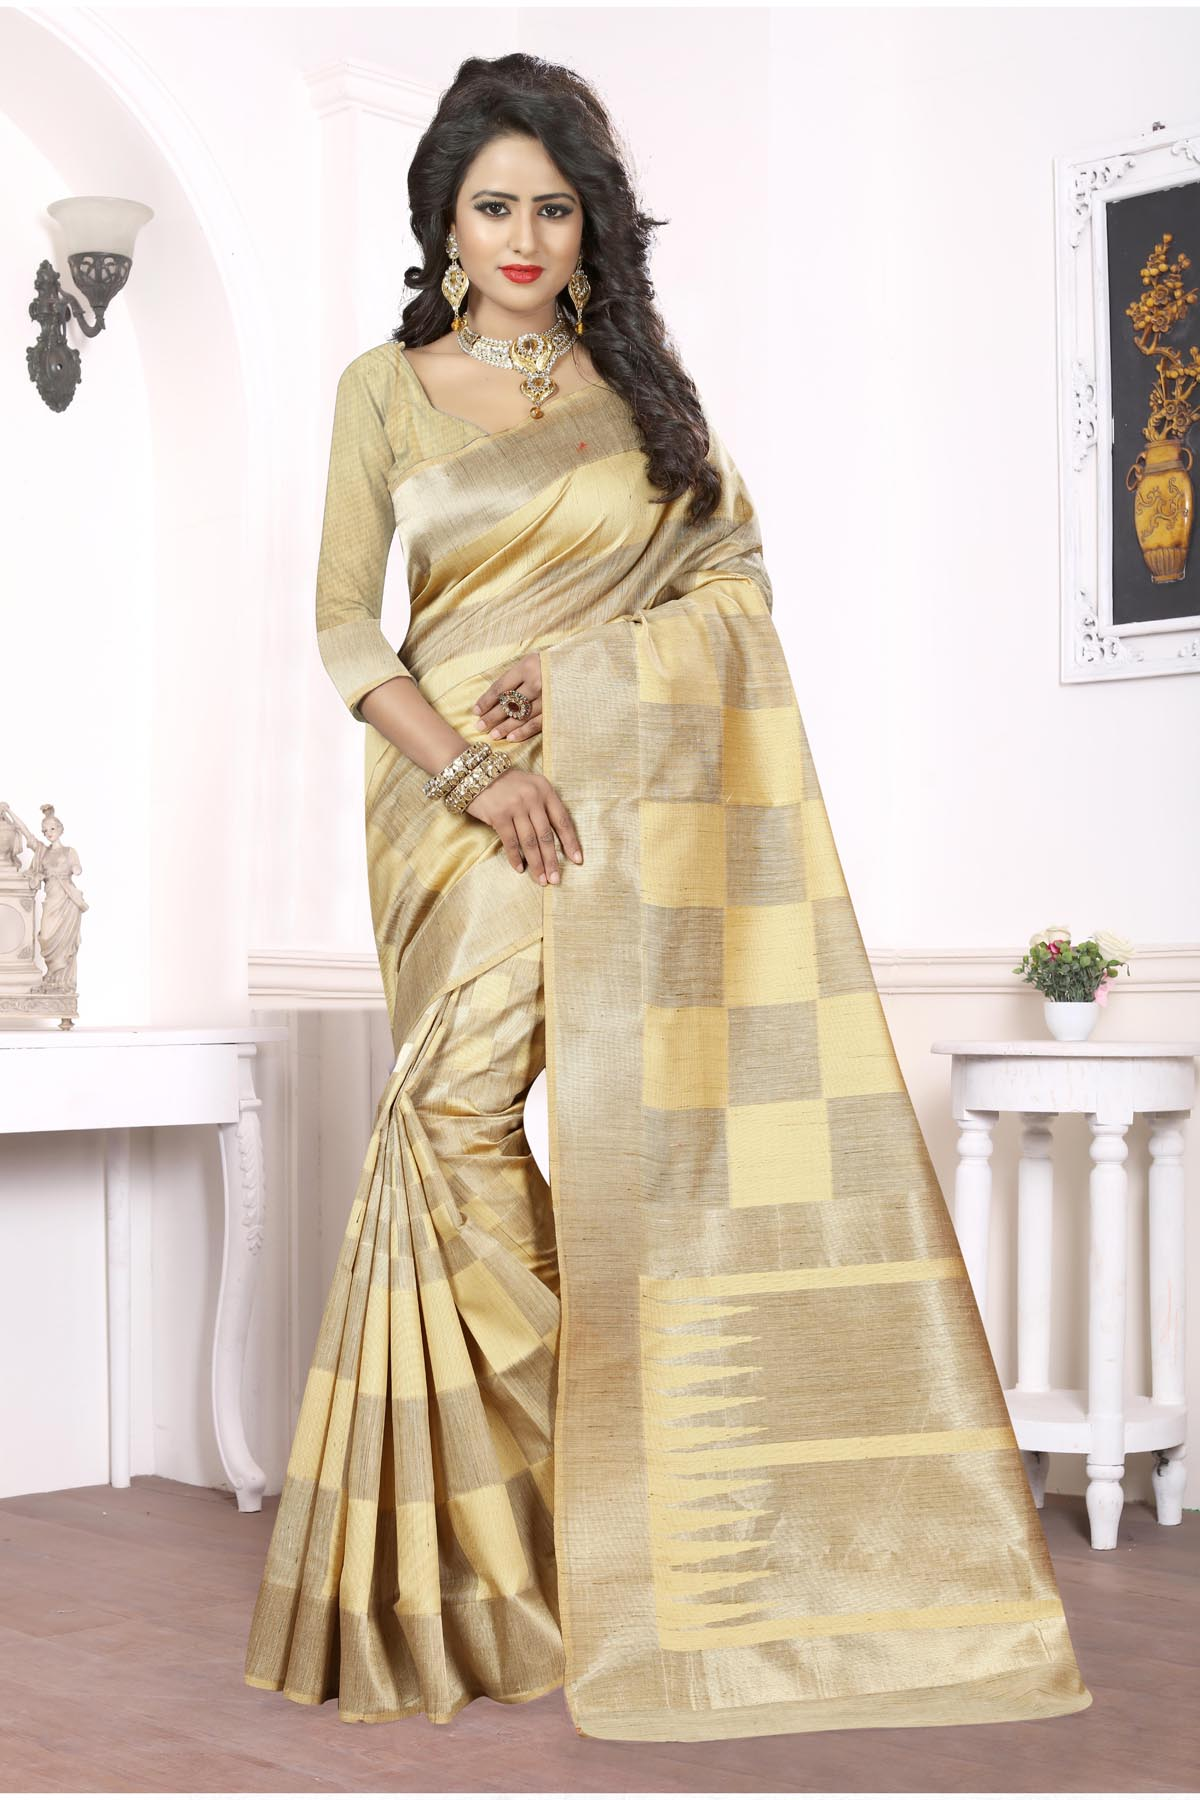 Printed Art Silk Saree (sari) in Cream